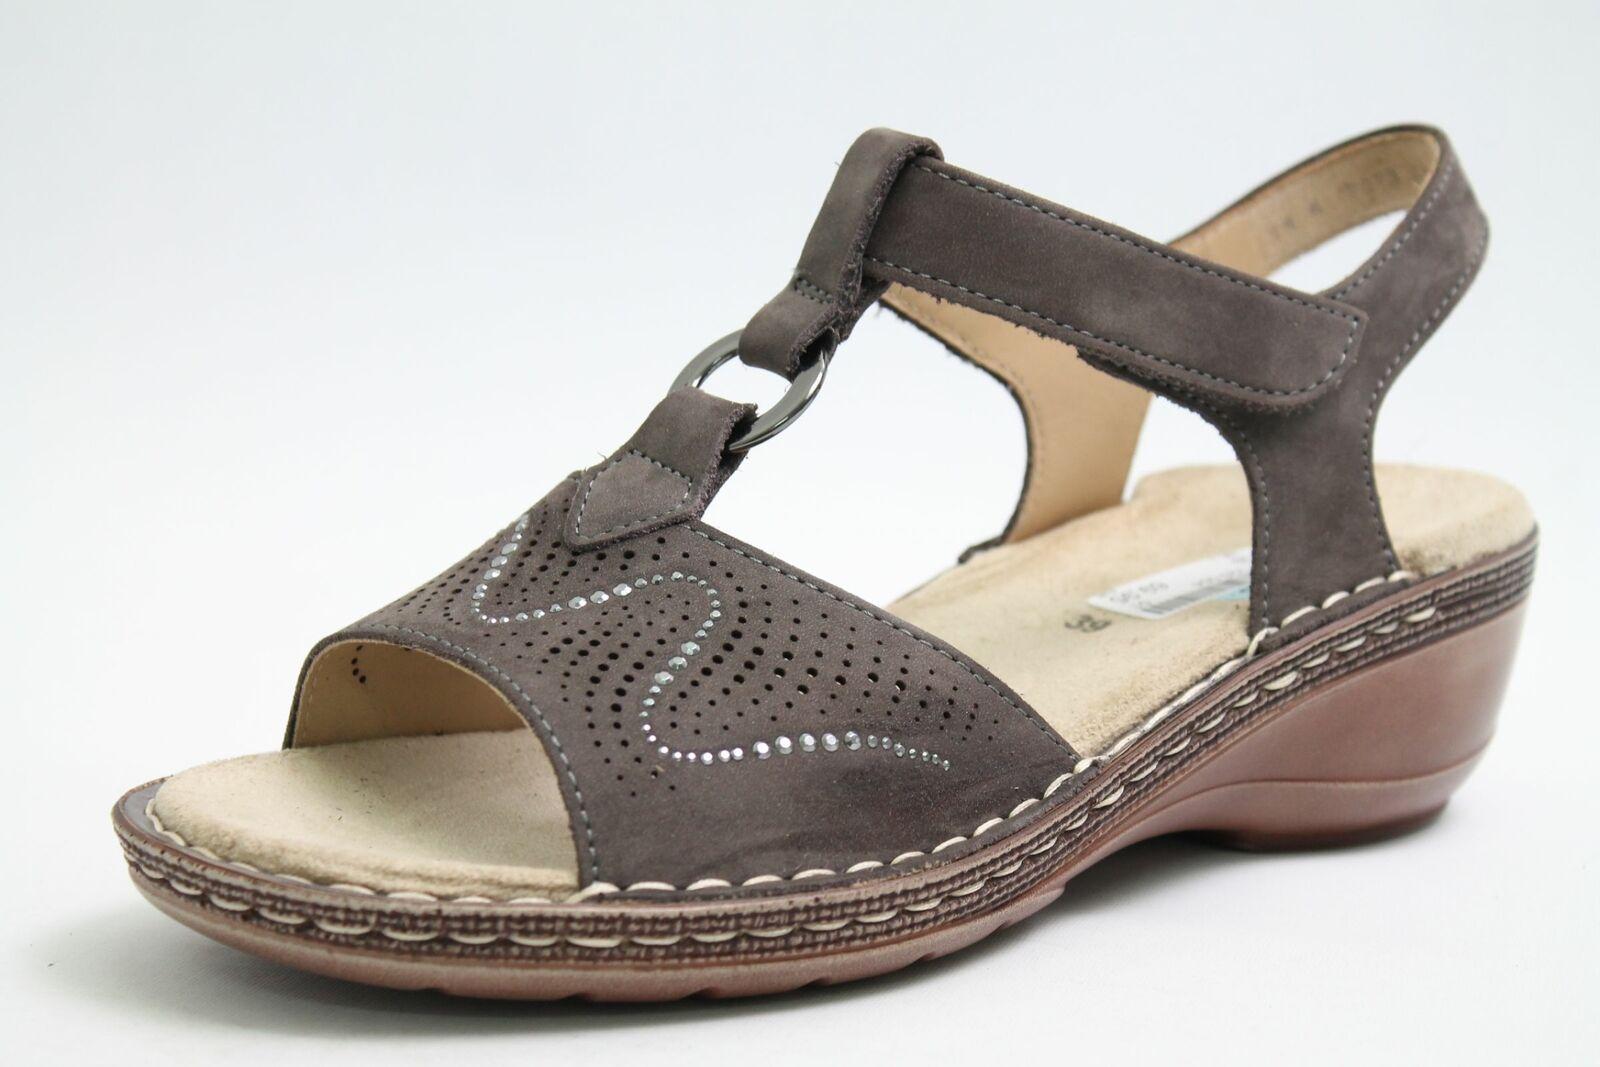 Ara Sandaletten grau echt Nubuk Leder Klettverschluss Schuhweite G Damen